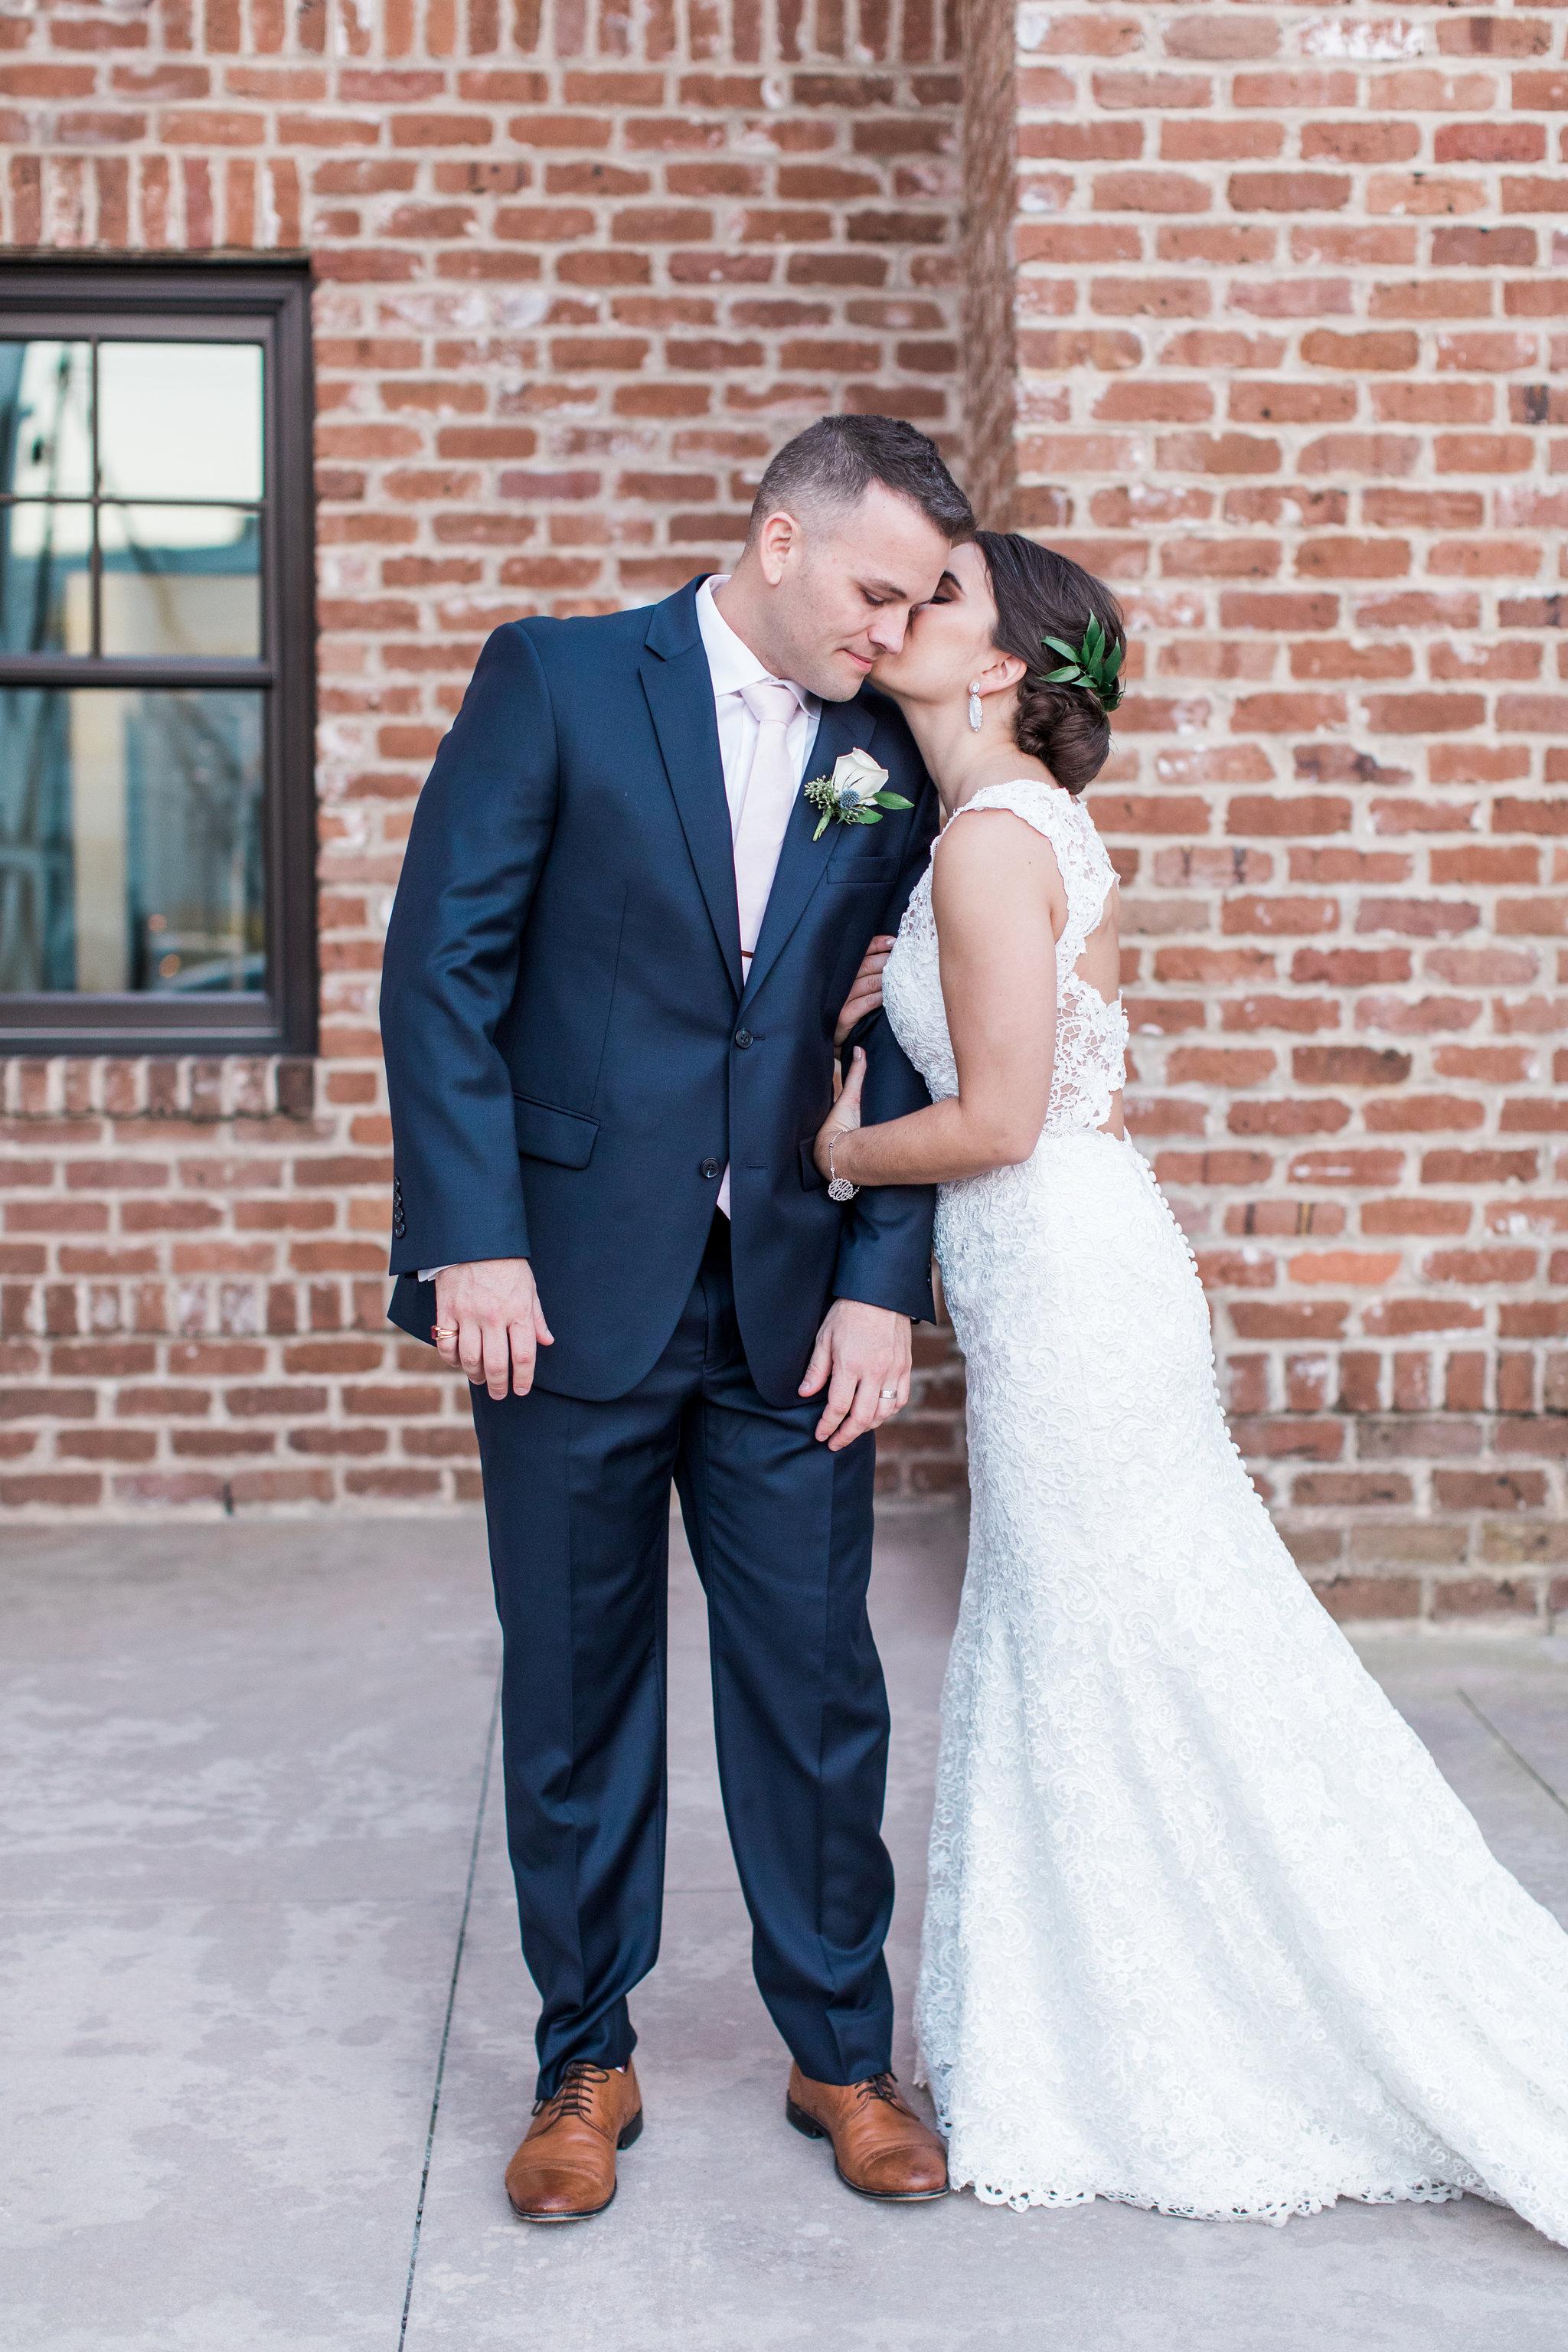 apt-b-photography-Savannah-wedding-photographer-savannah-engagement-photographer-historic-savannah-engagement-charles-h-morris-center-wedding-savannah-weddings-28.JPG